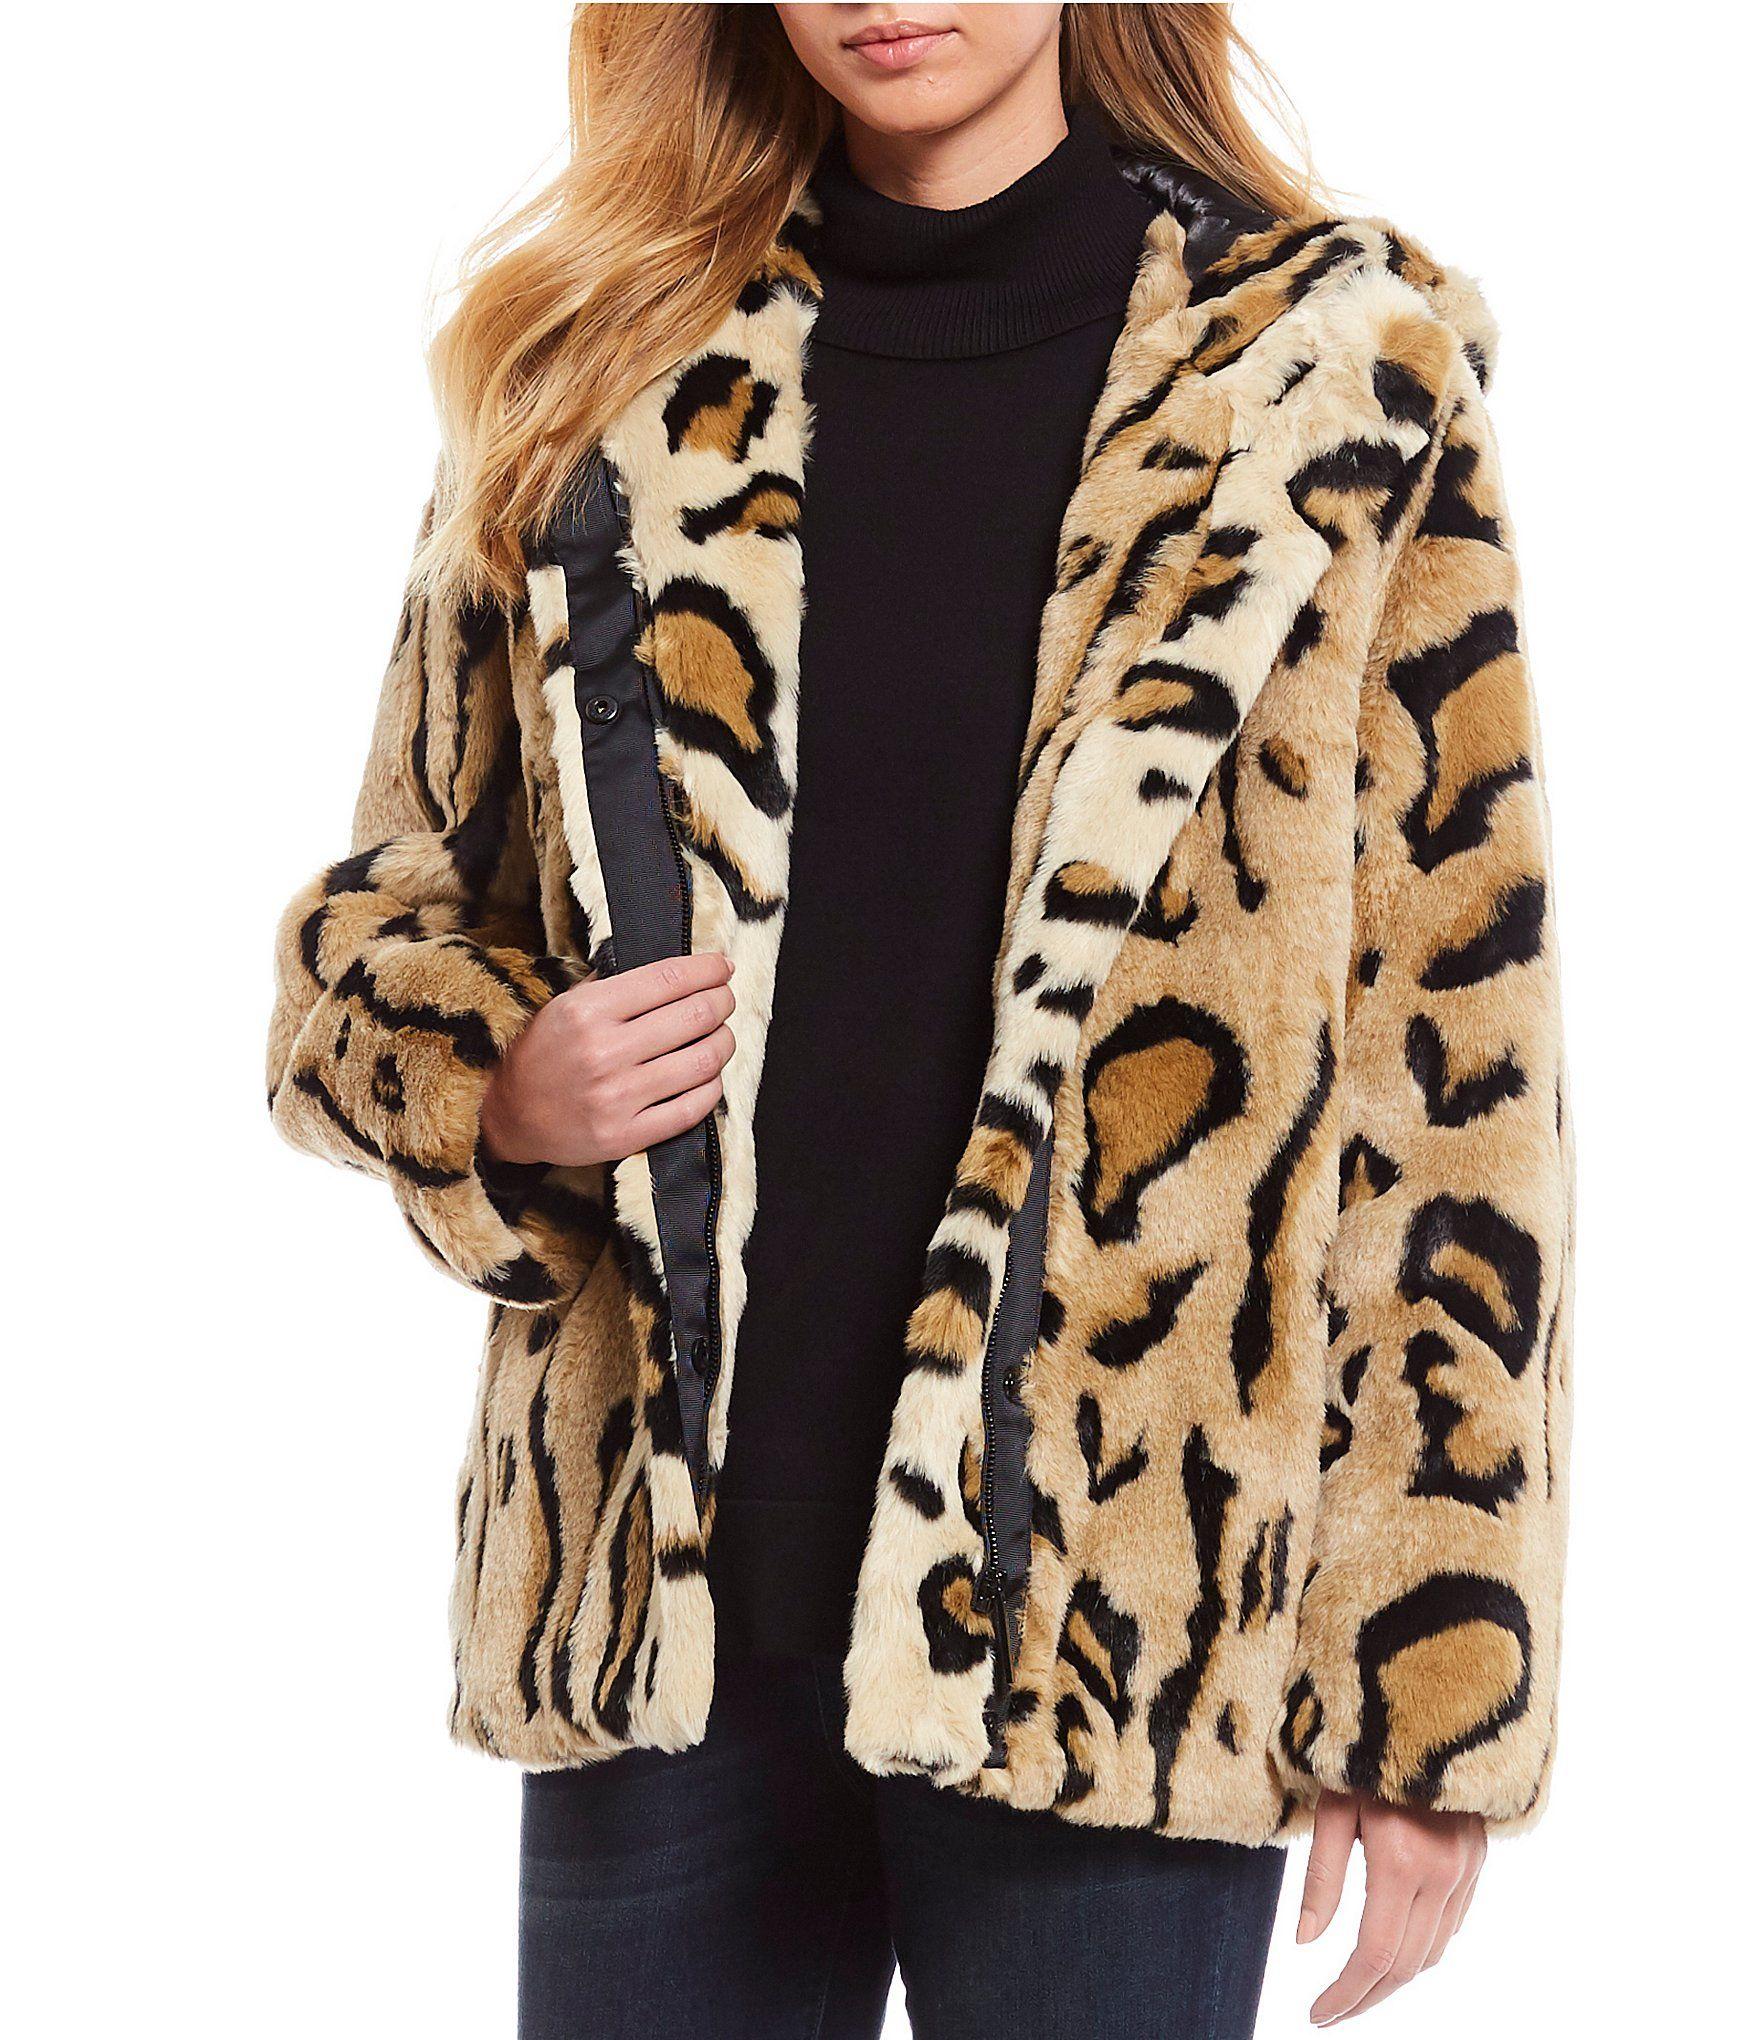 Hooded Cheetah Bomber Faux Fur Coat In 2020 Cheetah Jacket Faux Fur Cheetah Coat Calvin Klein